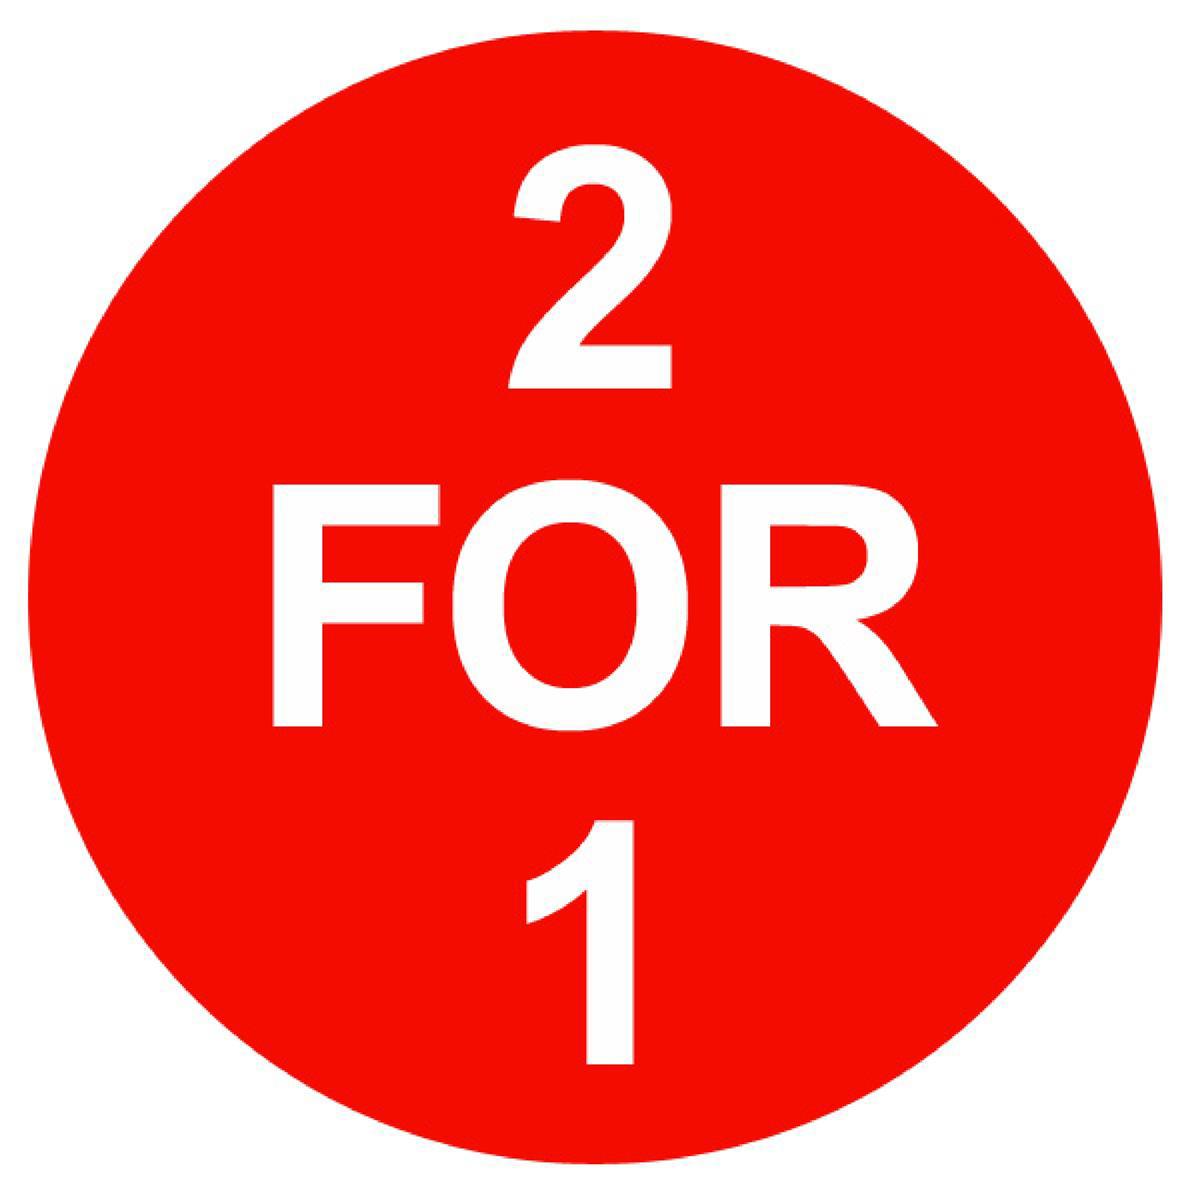 Post-it Z-notes Millennium Dispenser Ref DS440-SSCYL-EU 2 for 1 Jan-Dec 2018